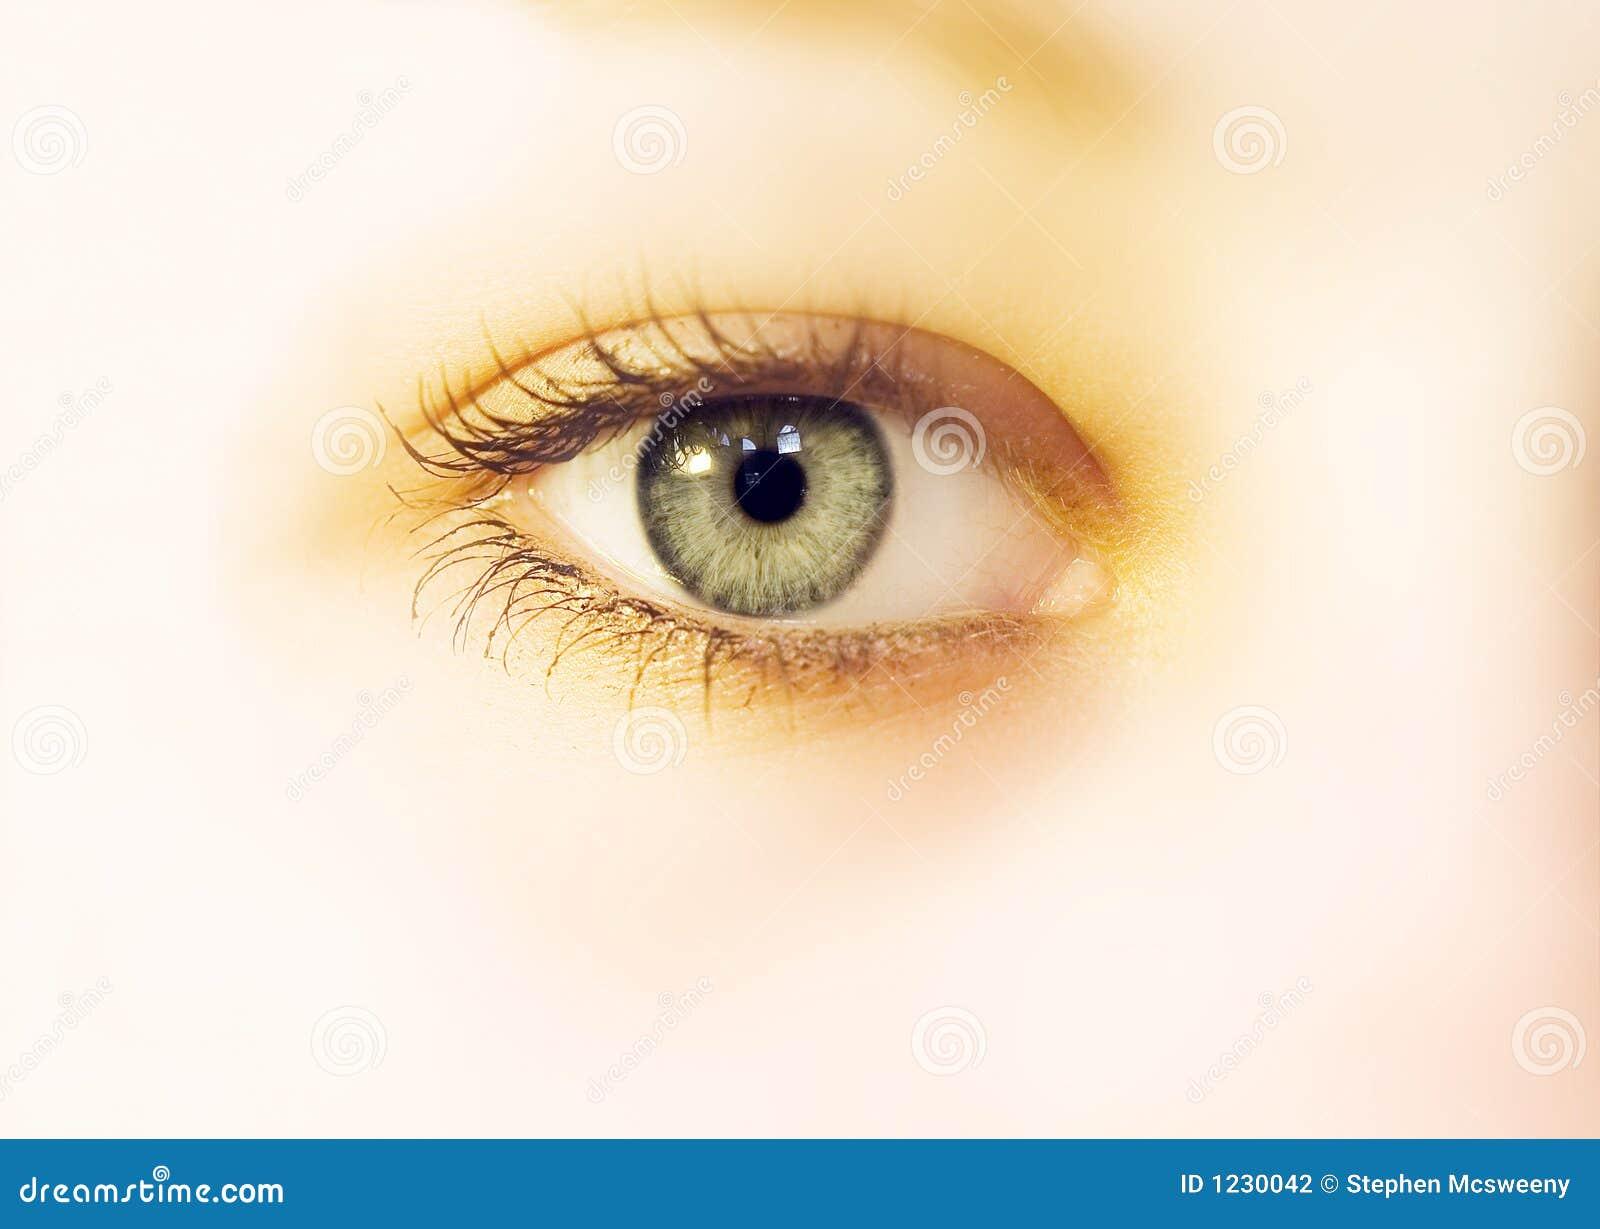 Squishy Eyeball : Eye soft stock photo. Image of glow, glamor, women, green - 1230042